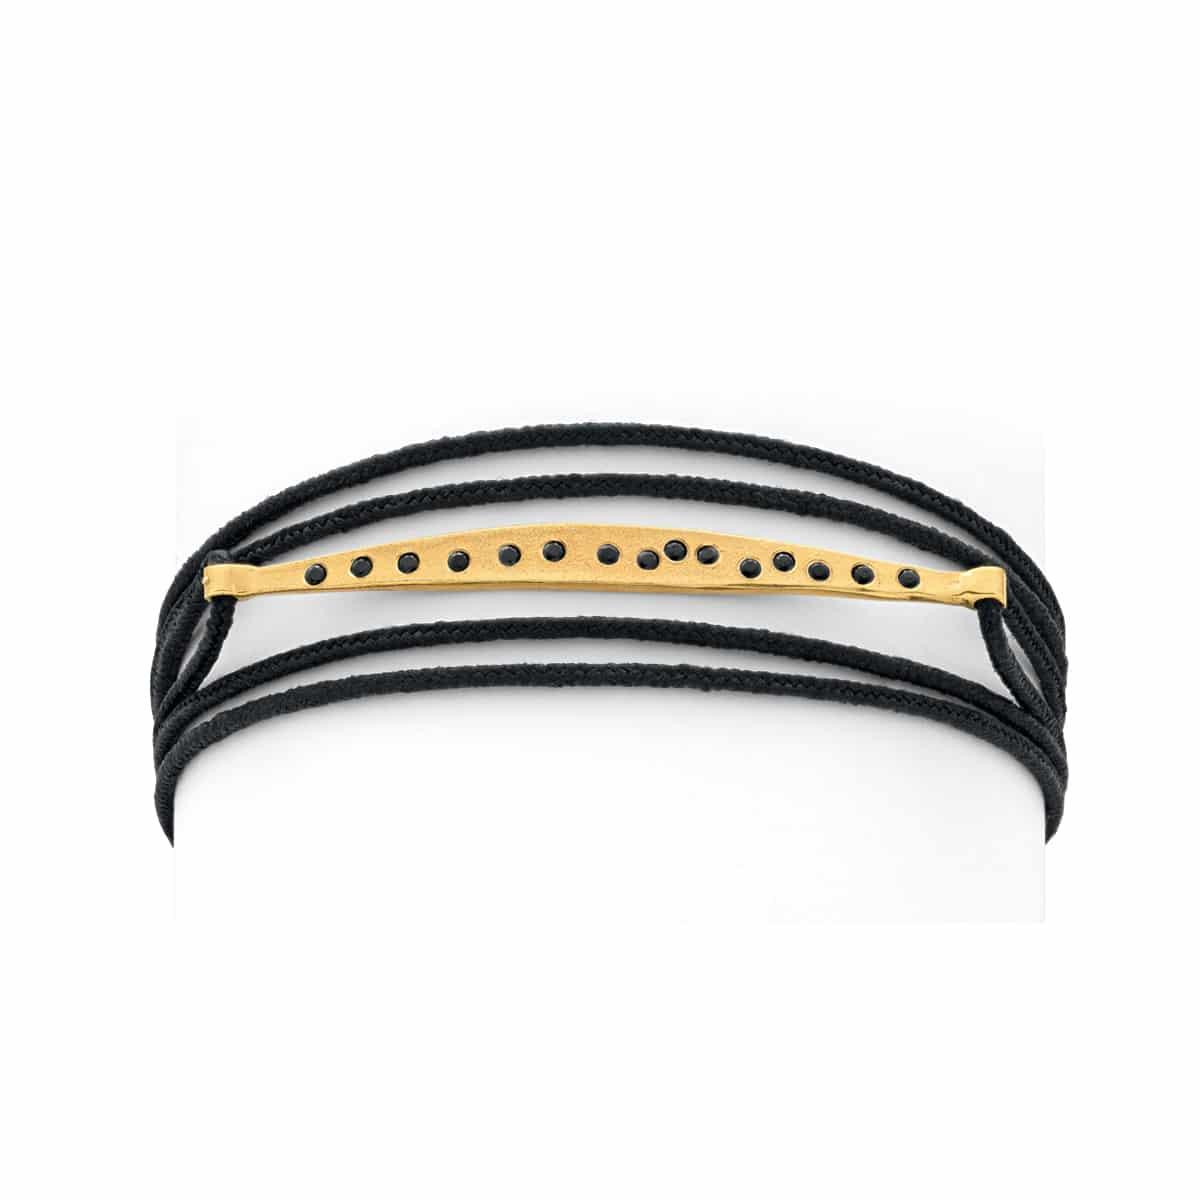 Bracelet feuille de saule Atelier de Famille